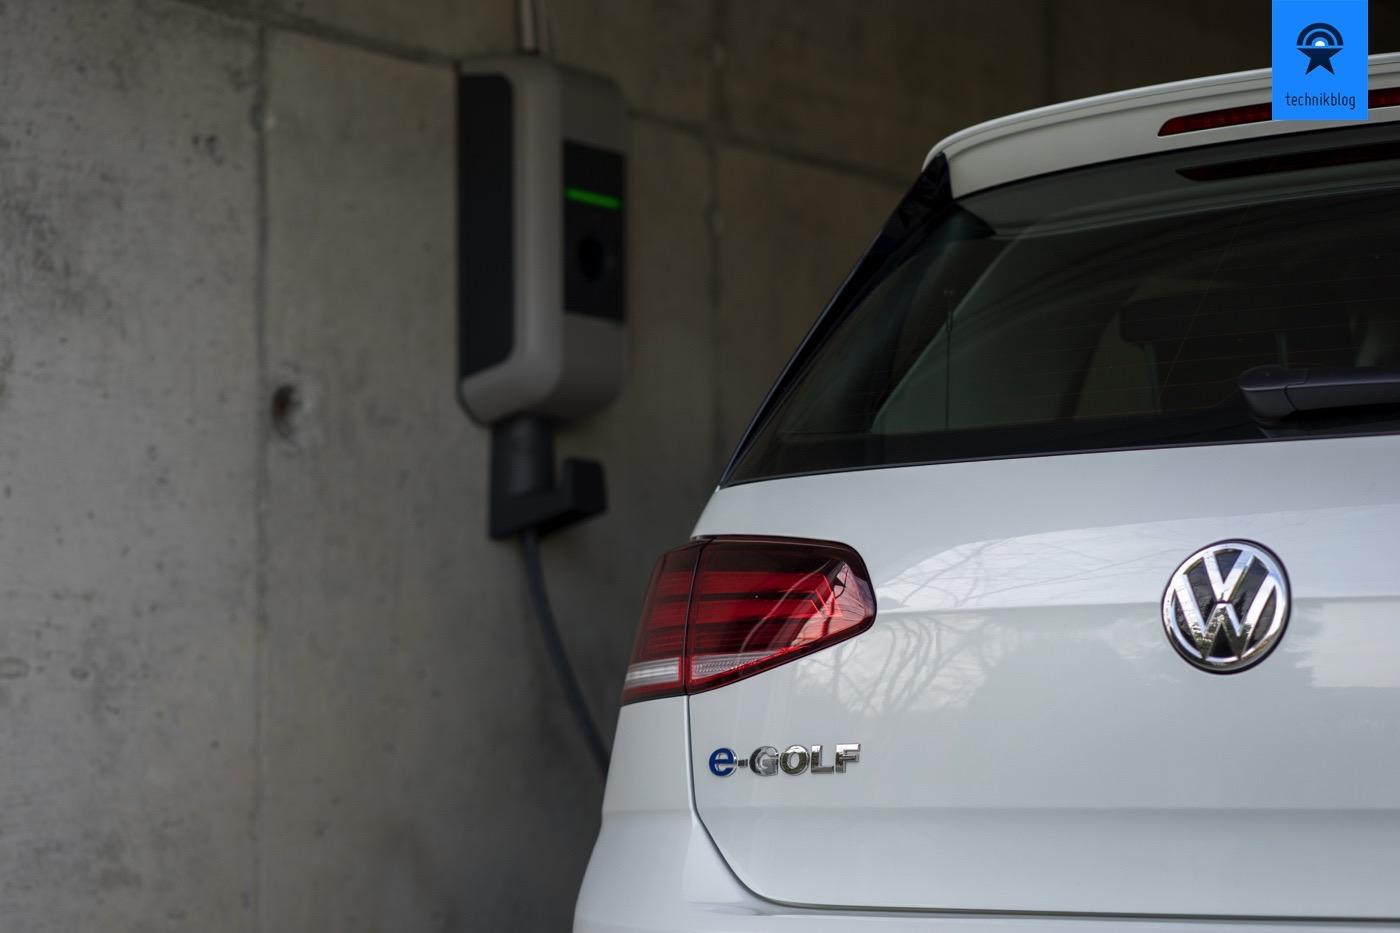 Keba P30 und VW e-Golf 2017